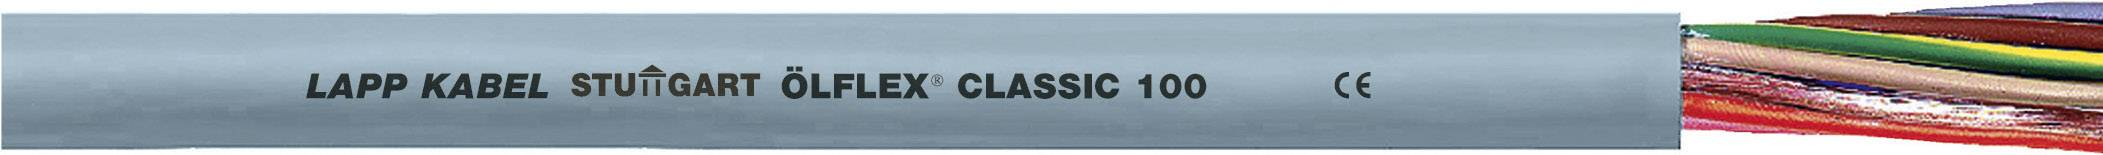 Kabel LappKabel Ölflex CLASSIC 100 4G1 (00100434), PVC, 6,5 mm, 500 V, šedá, 1000 m